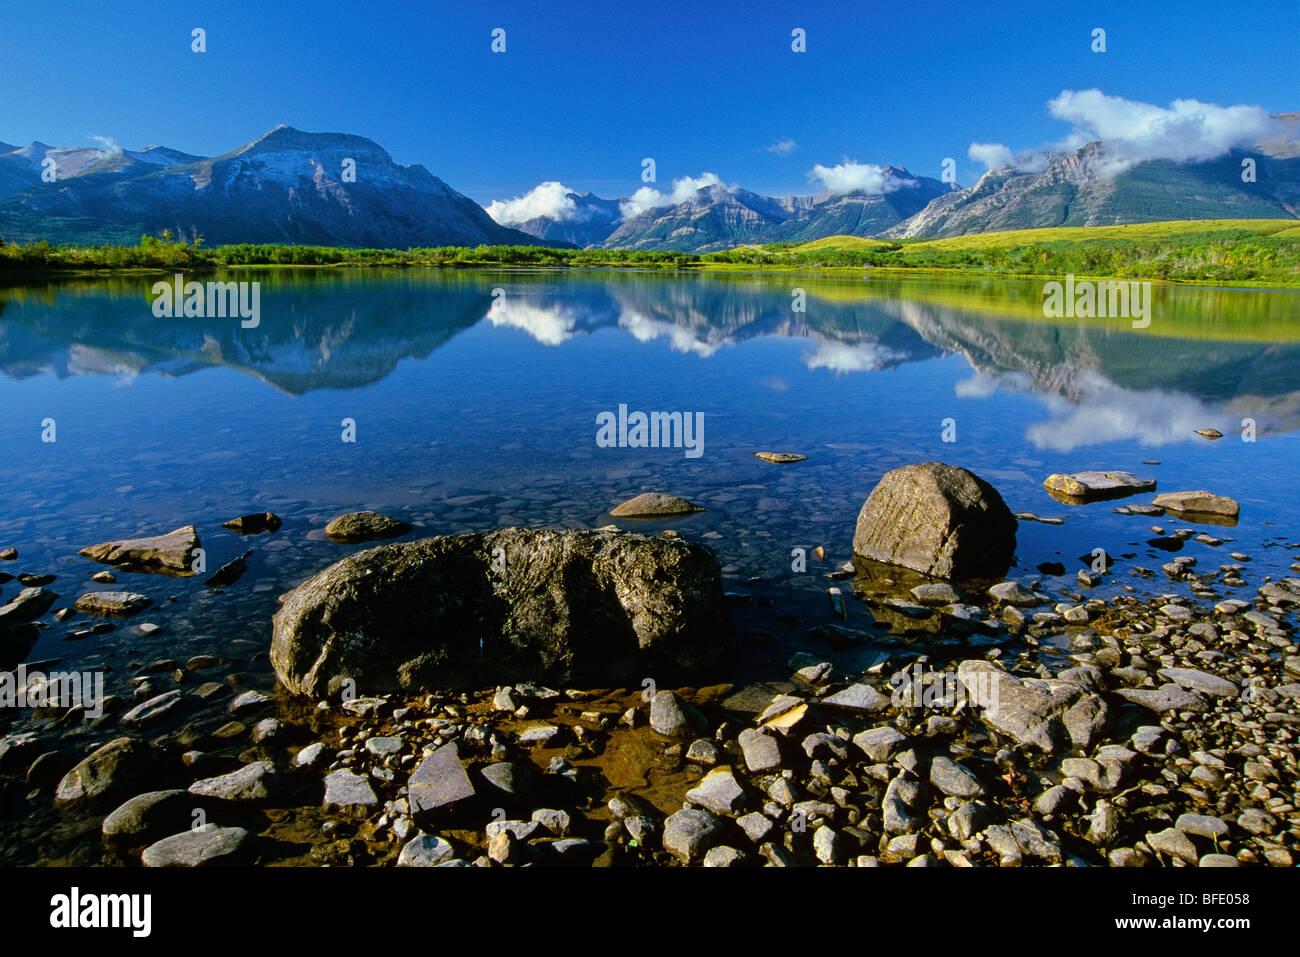 Vimy Peak und Lower Waterton Lake, Waterton Lakes National Park, Alberta, Kanada Stockbild